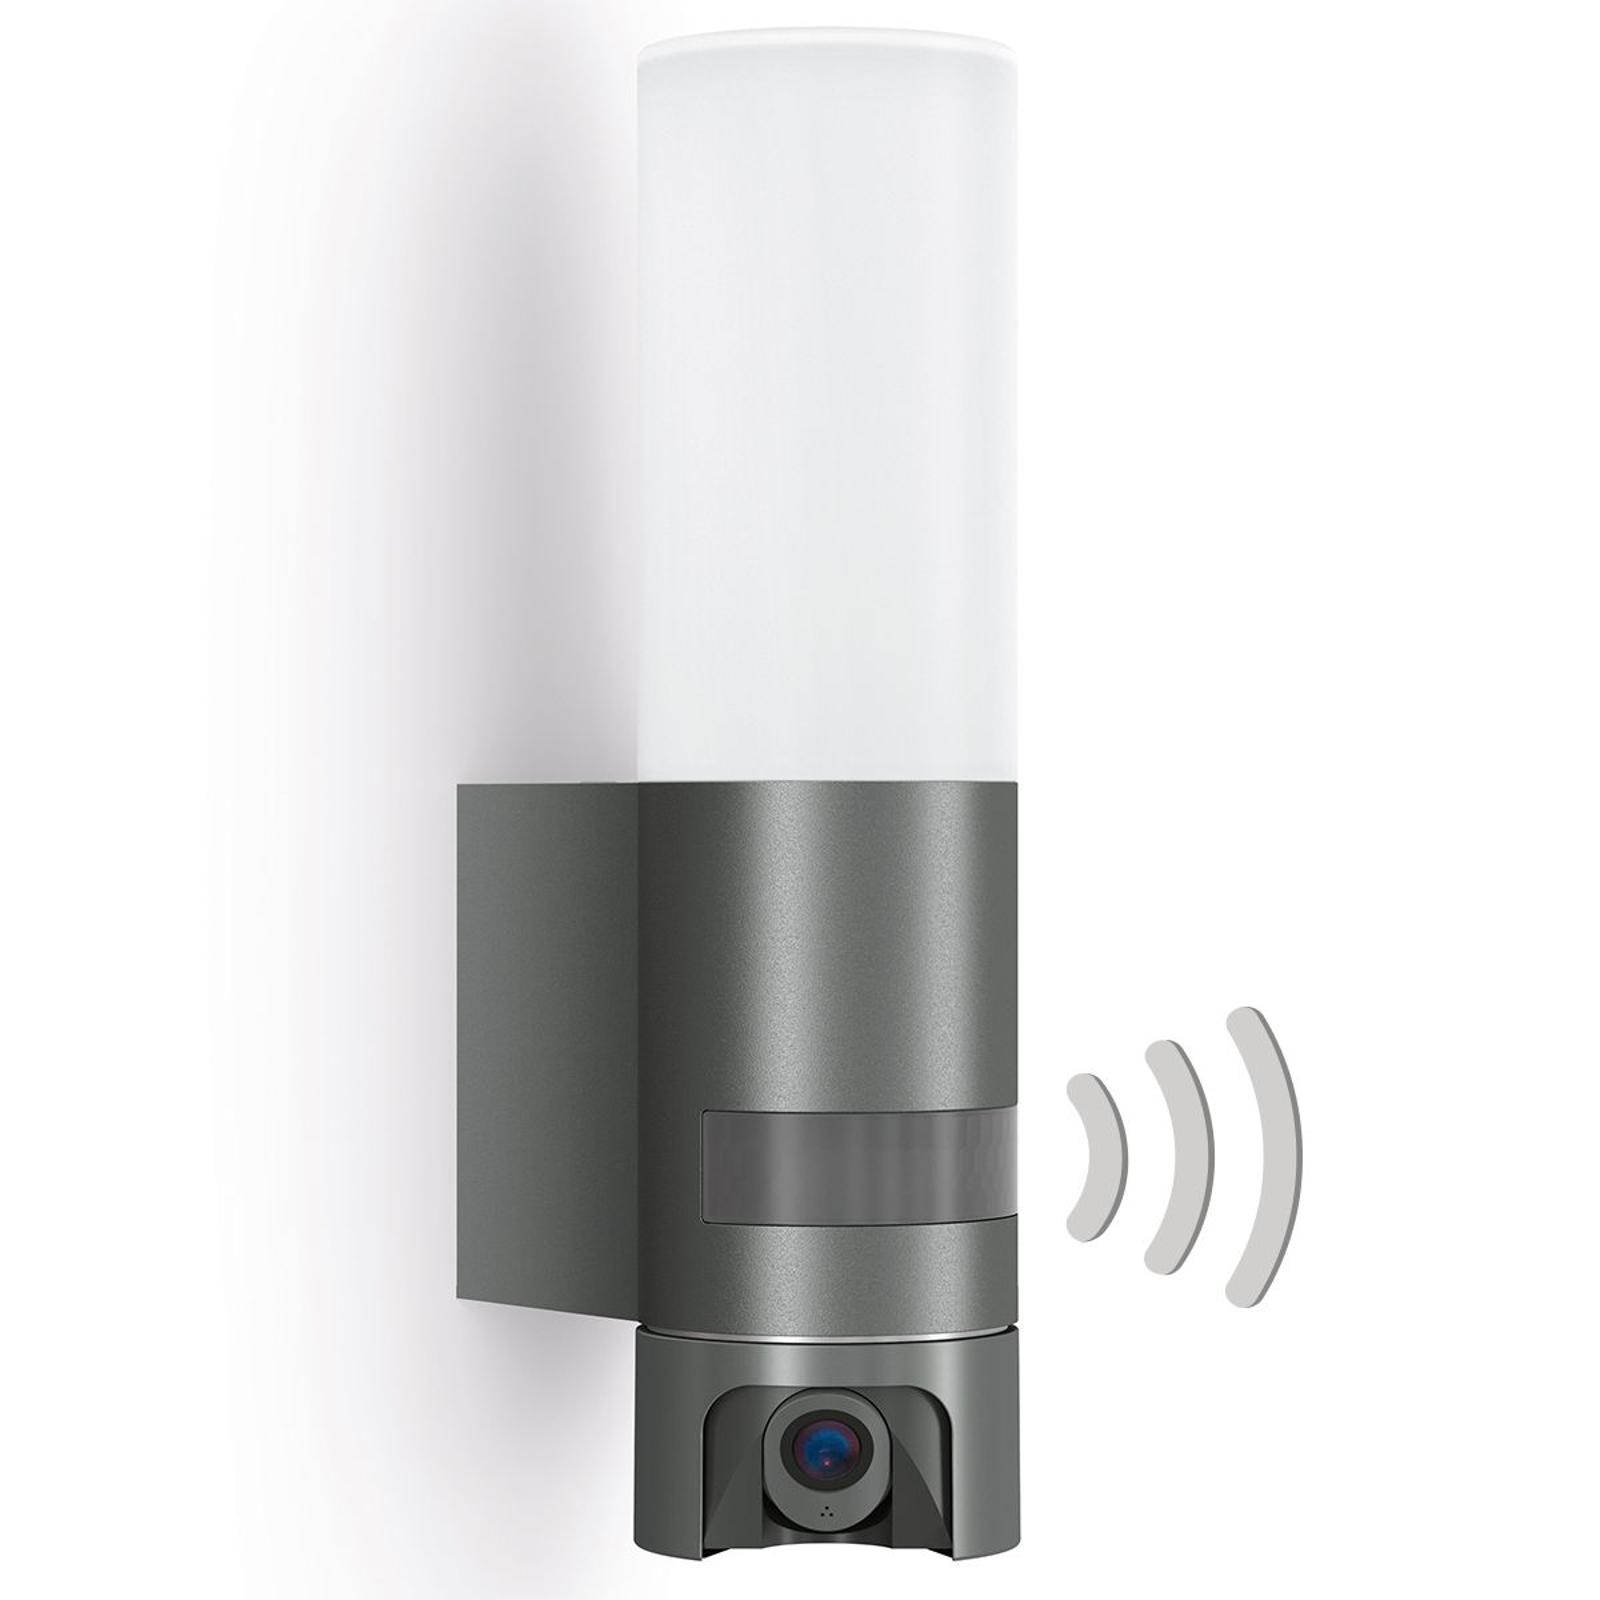 Sensor LED buiten wandlamp L 620 Cam, antraciet